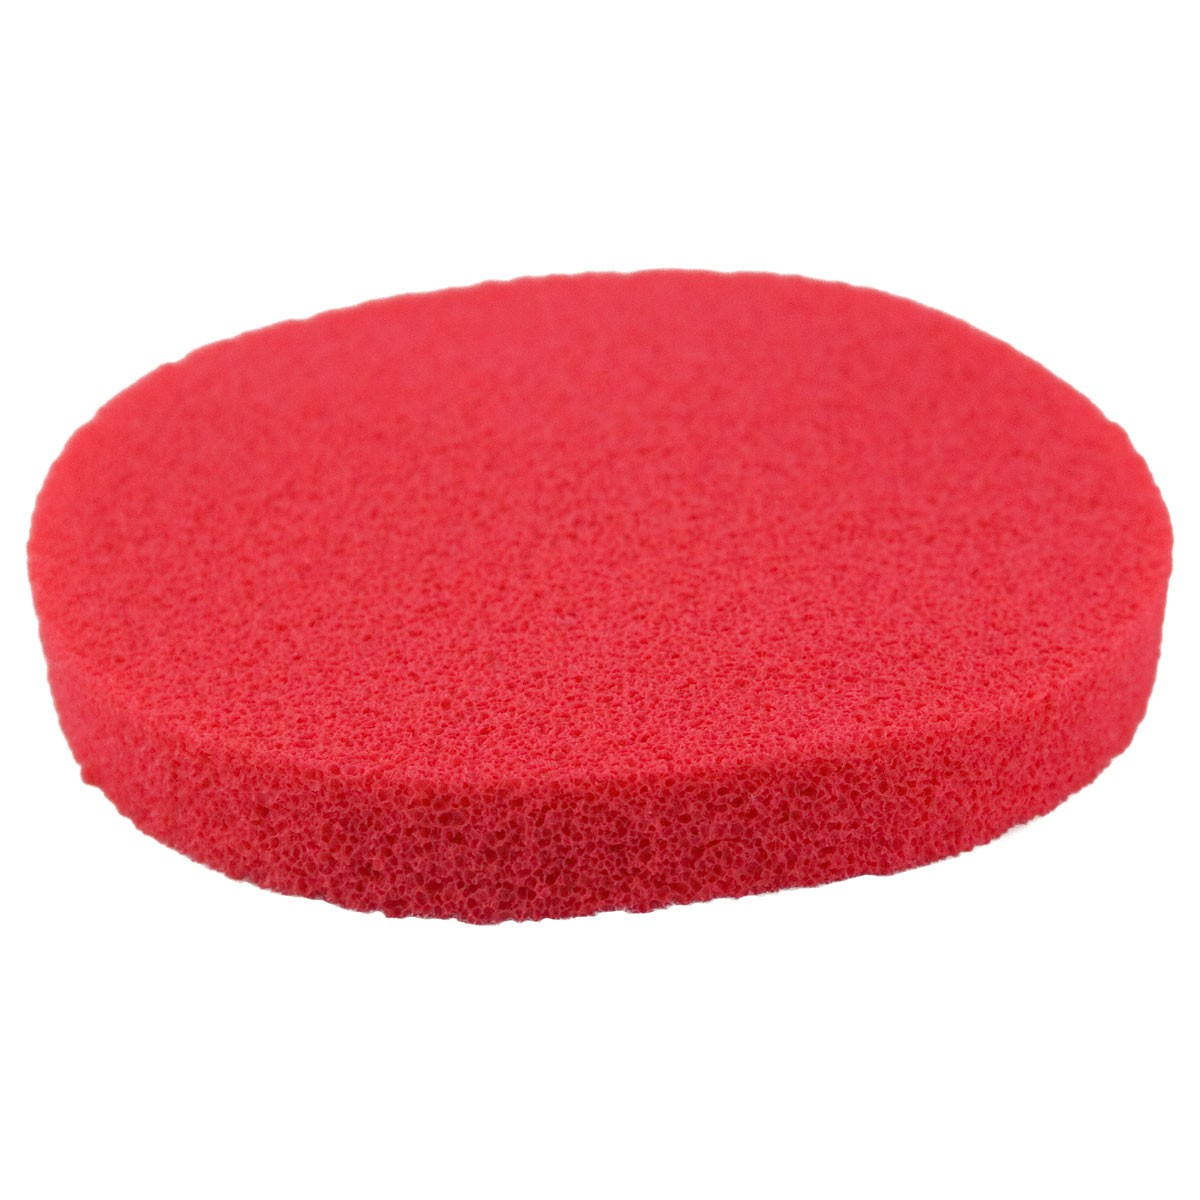 STIPPLE SPONGE, RED, WHOLE ROUND